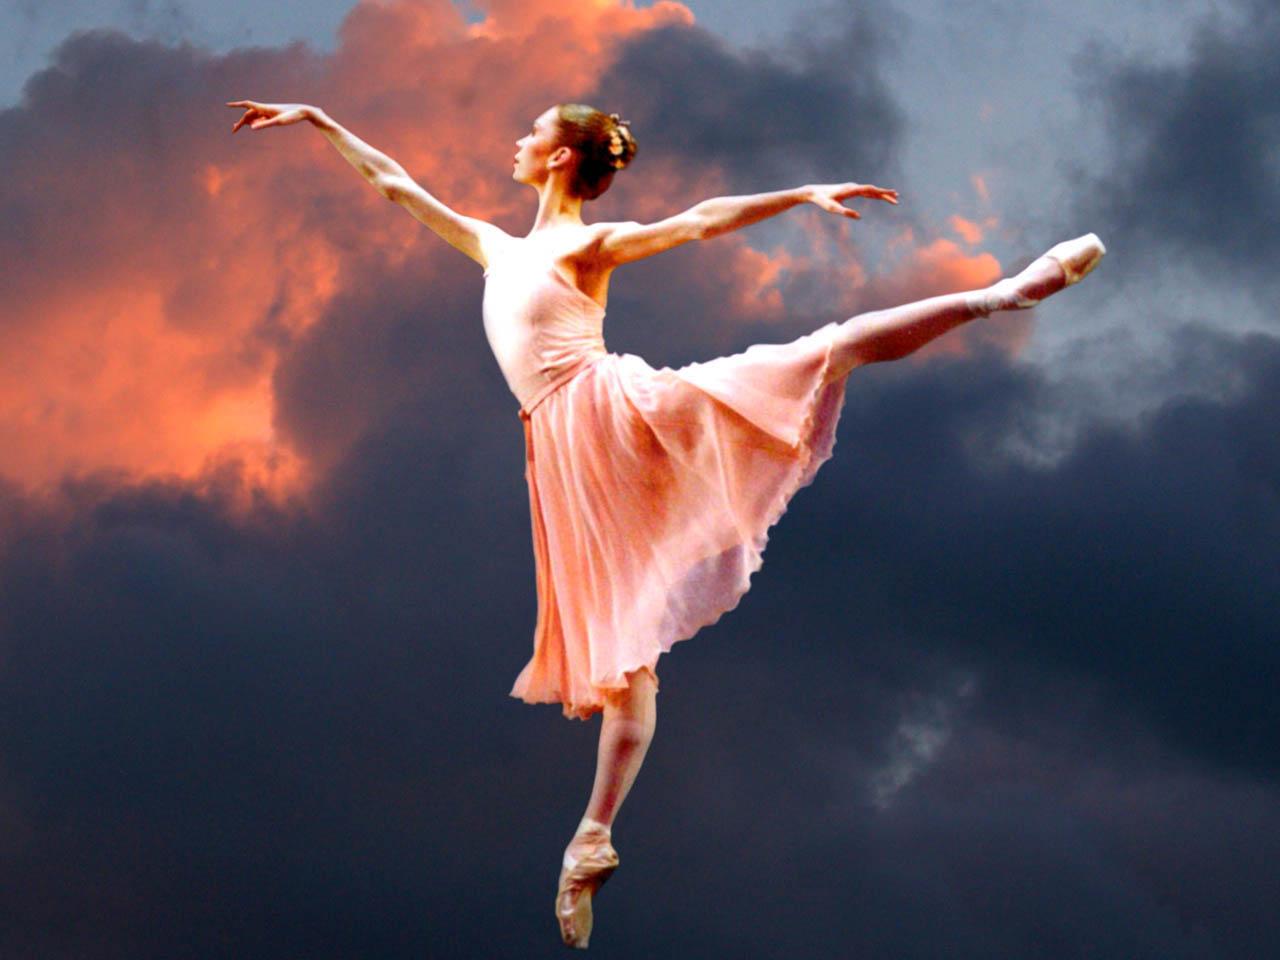 Ballet Dance Wallpapers Hd Resolution Dodskypict: Ballerina Wallpaper